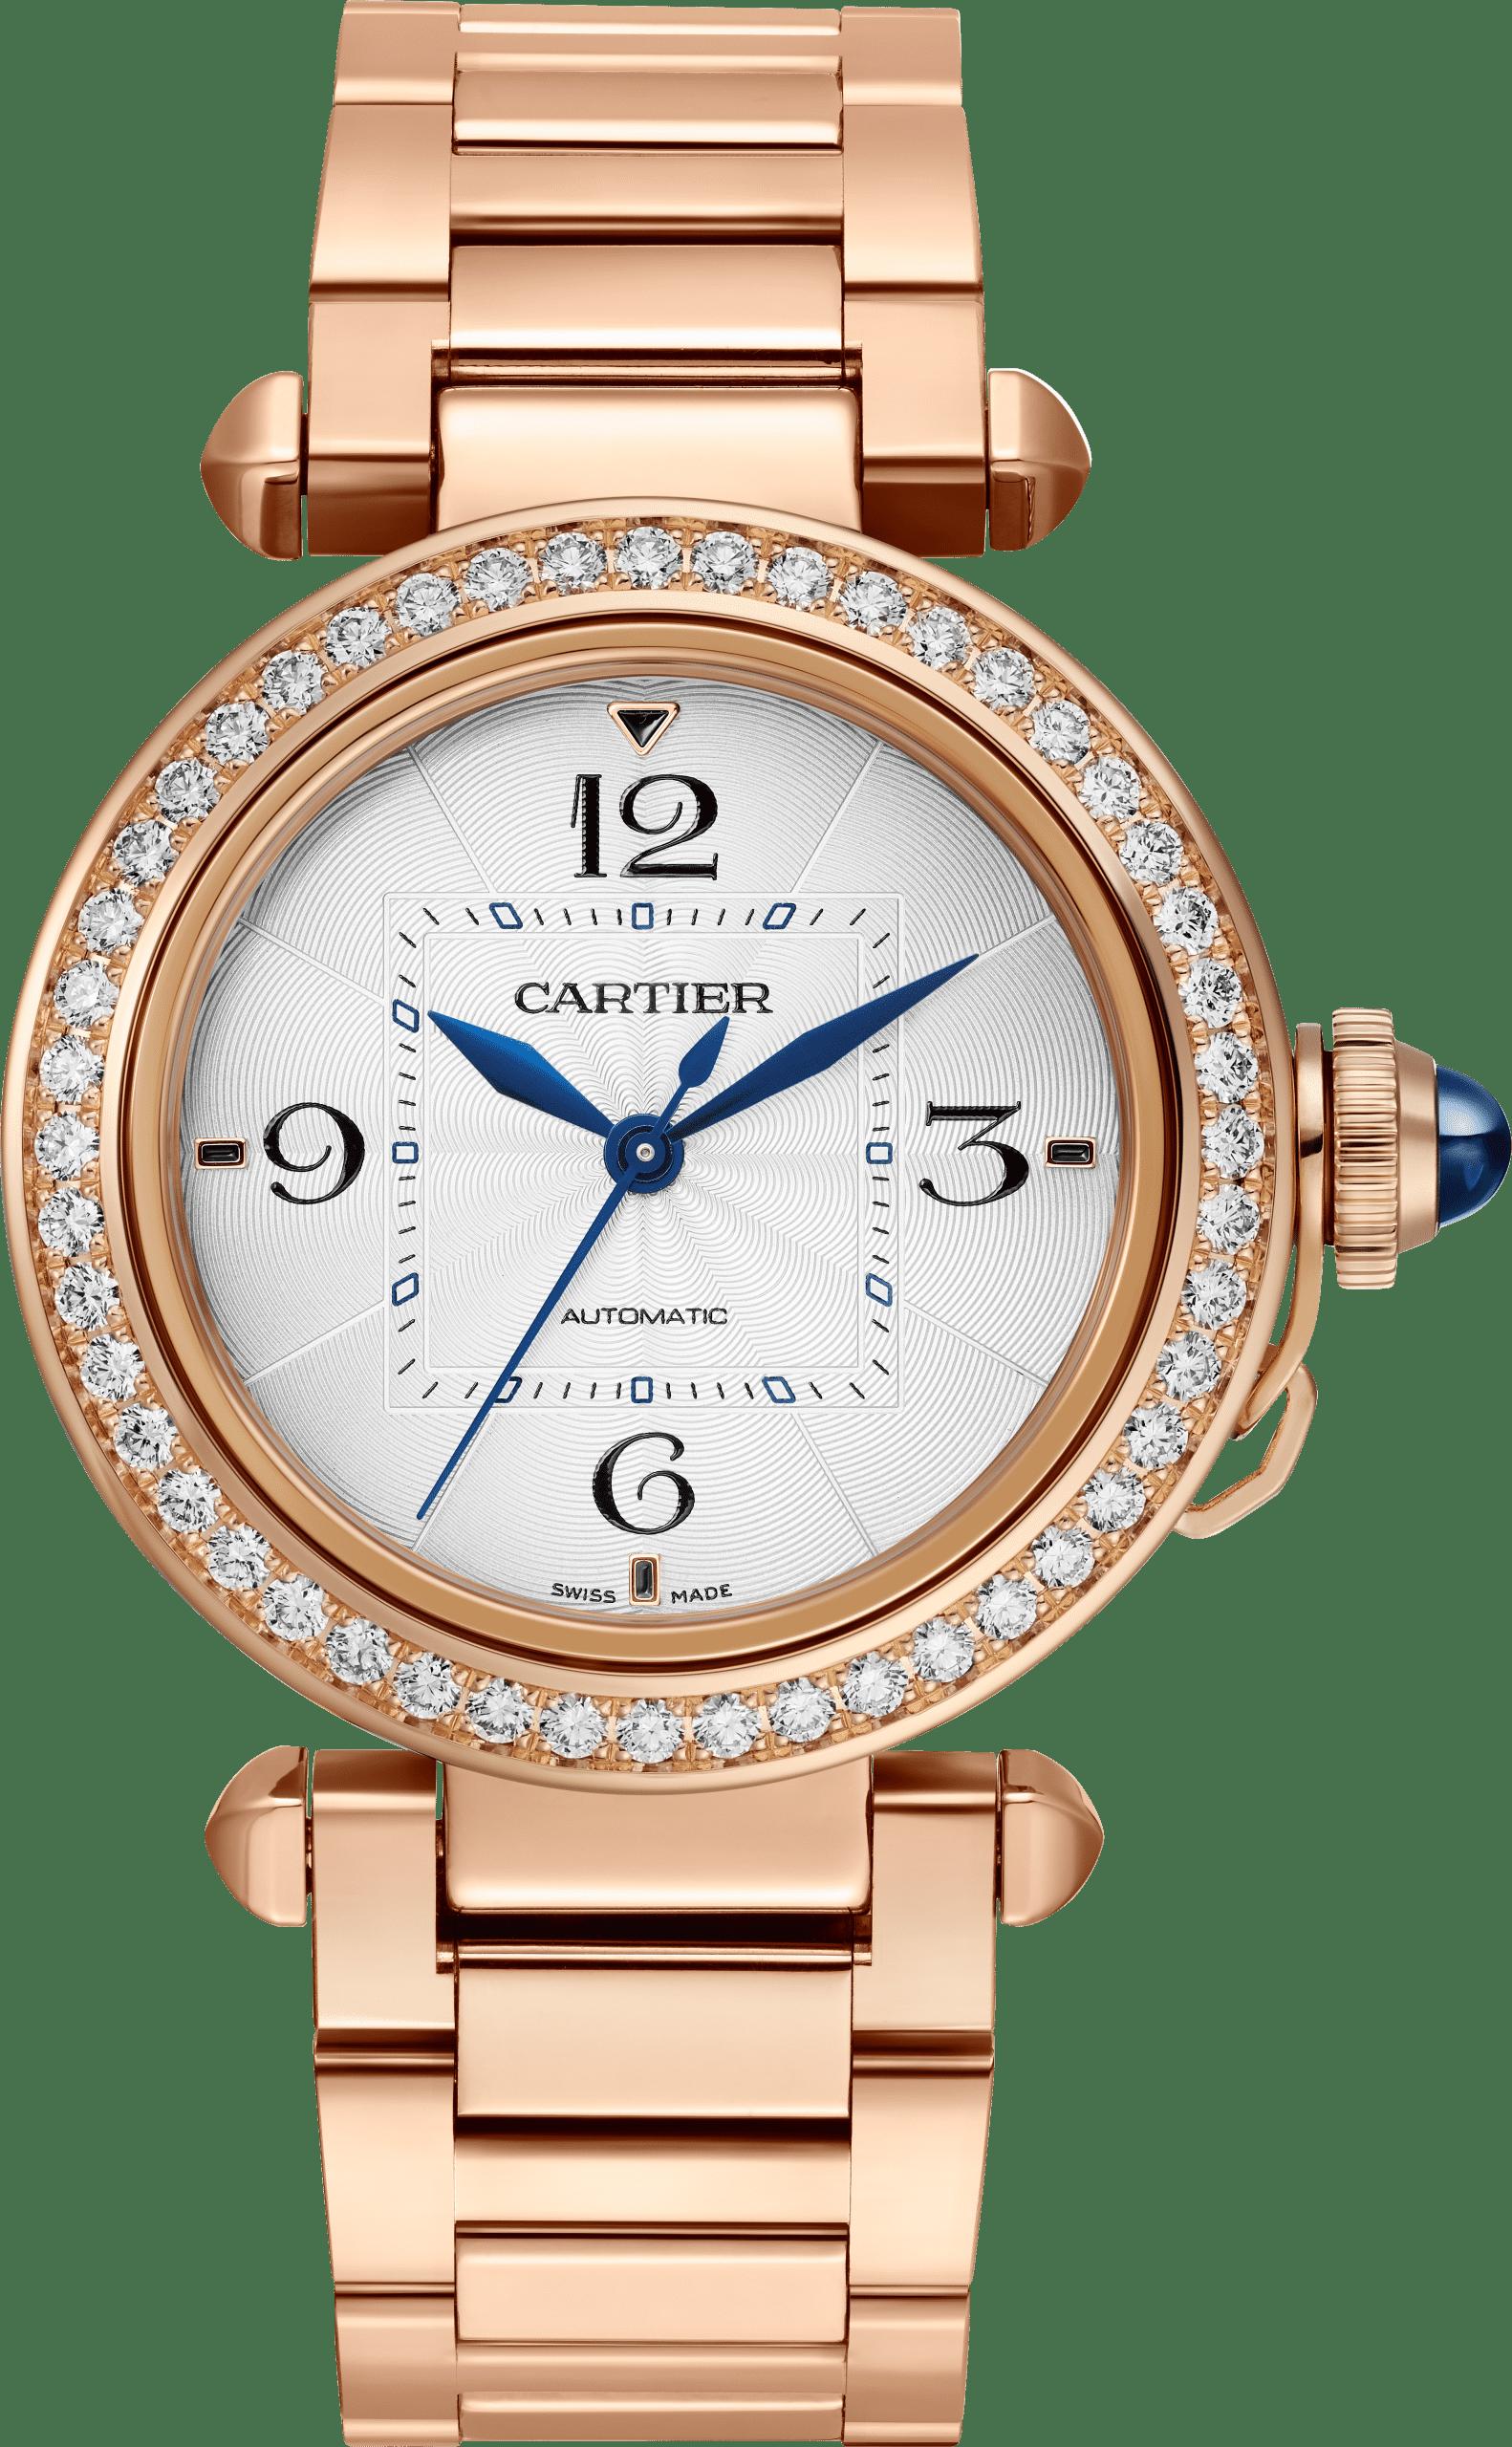 Edel und teuer in Roségold mit Diamanten: Die Cartier Pasha de Cartier 35 mm, Referent WJPA0013